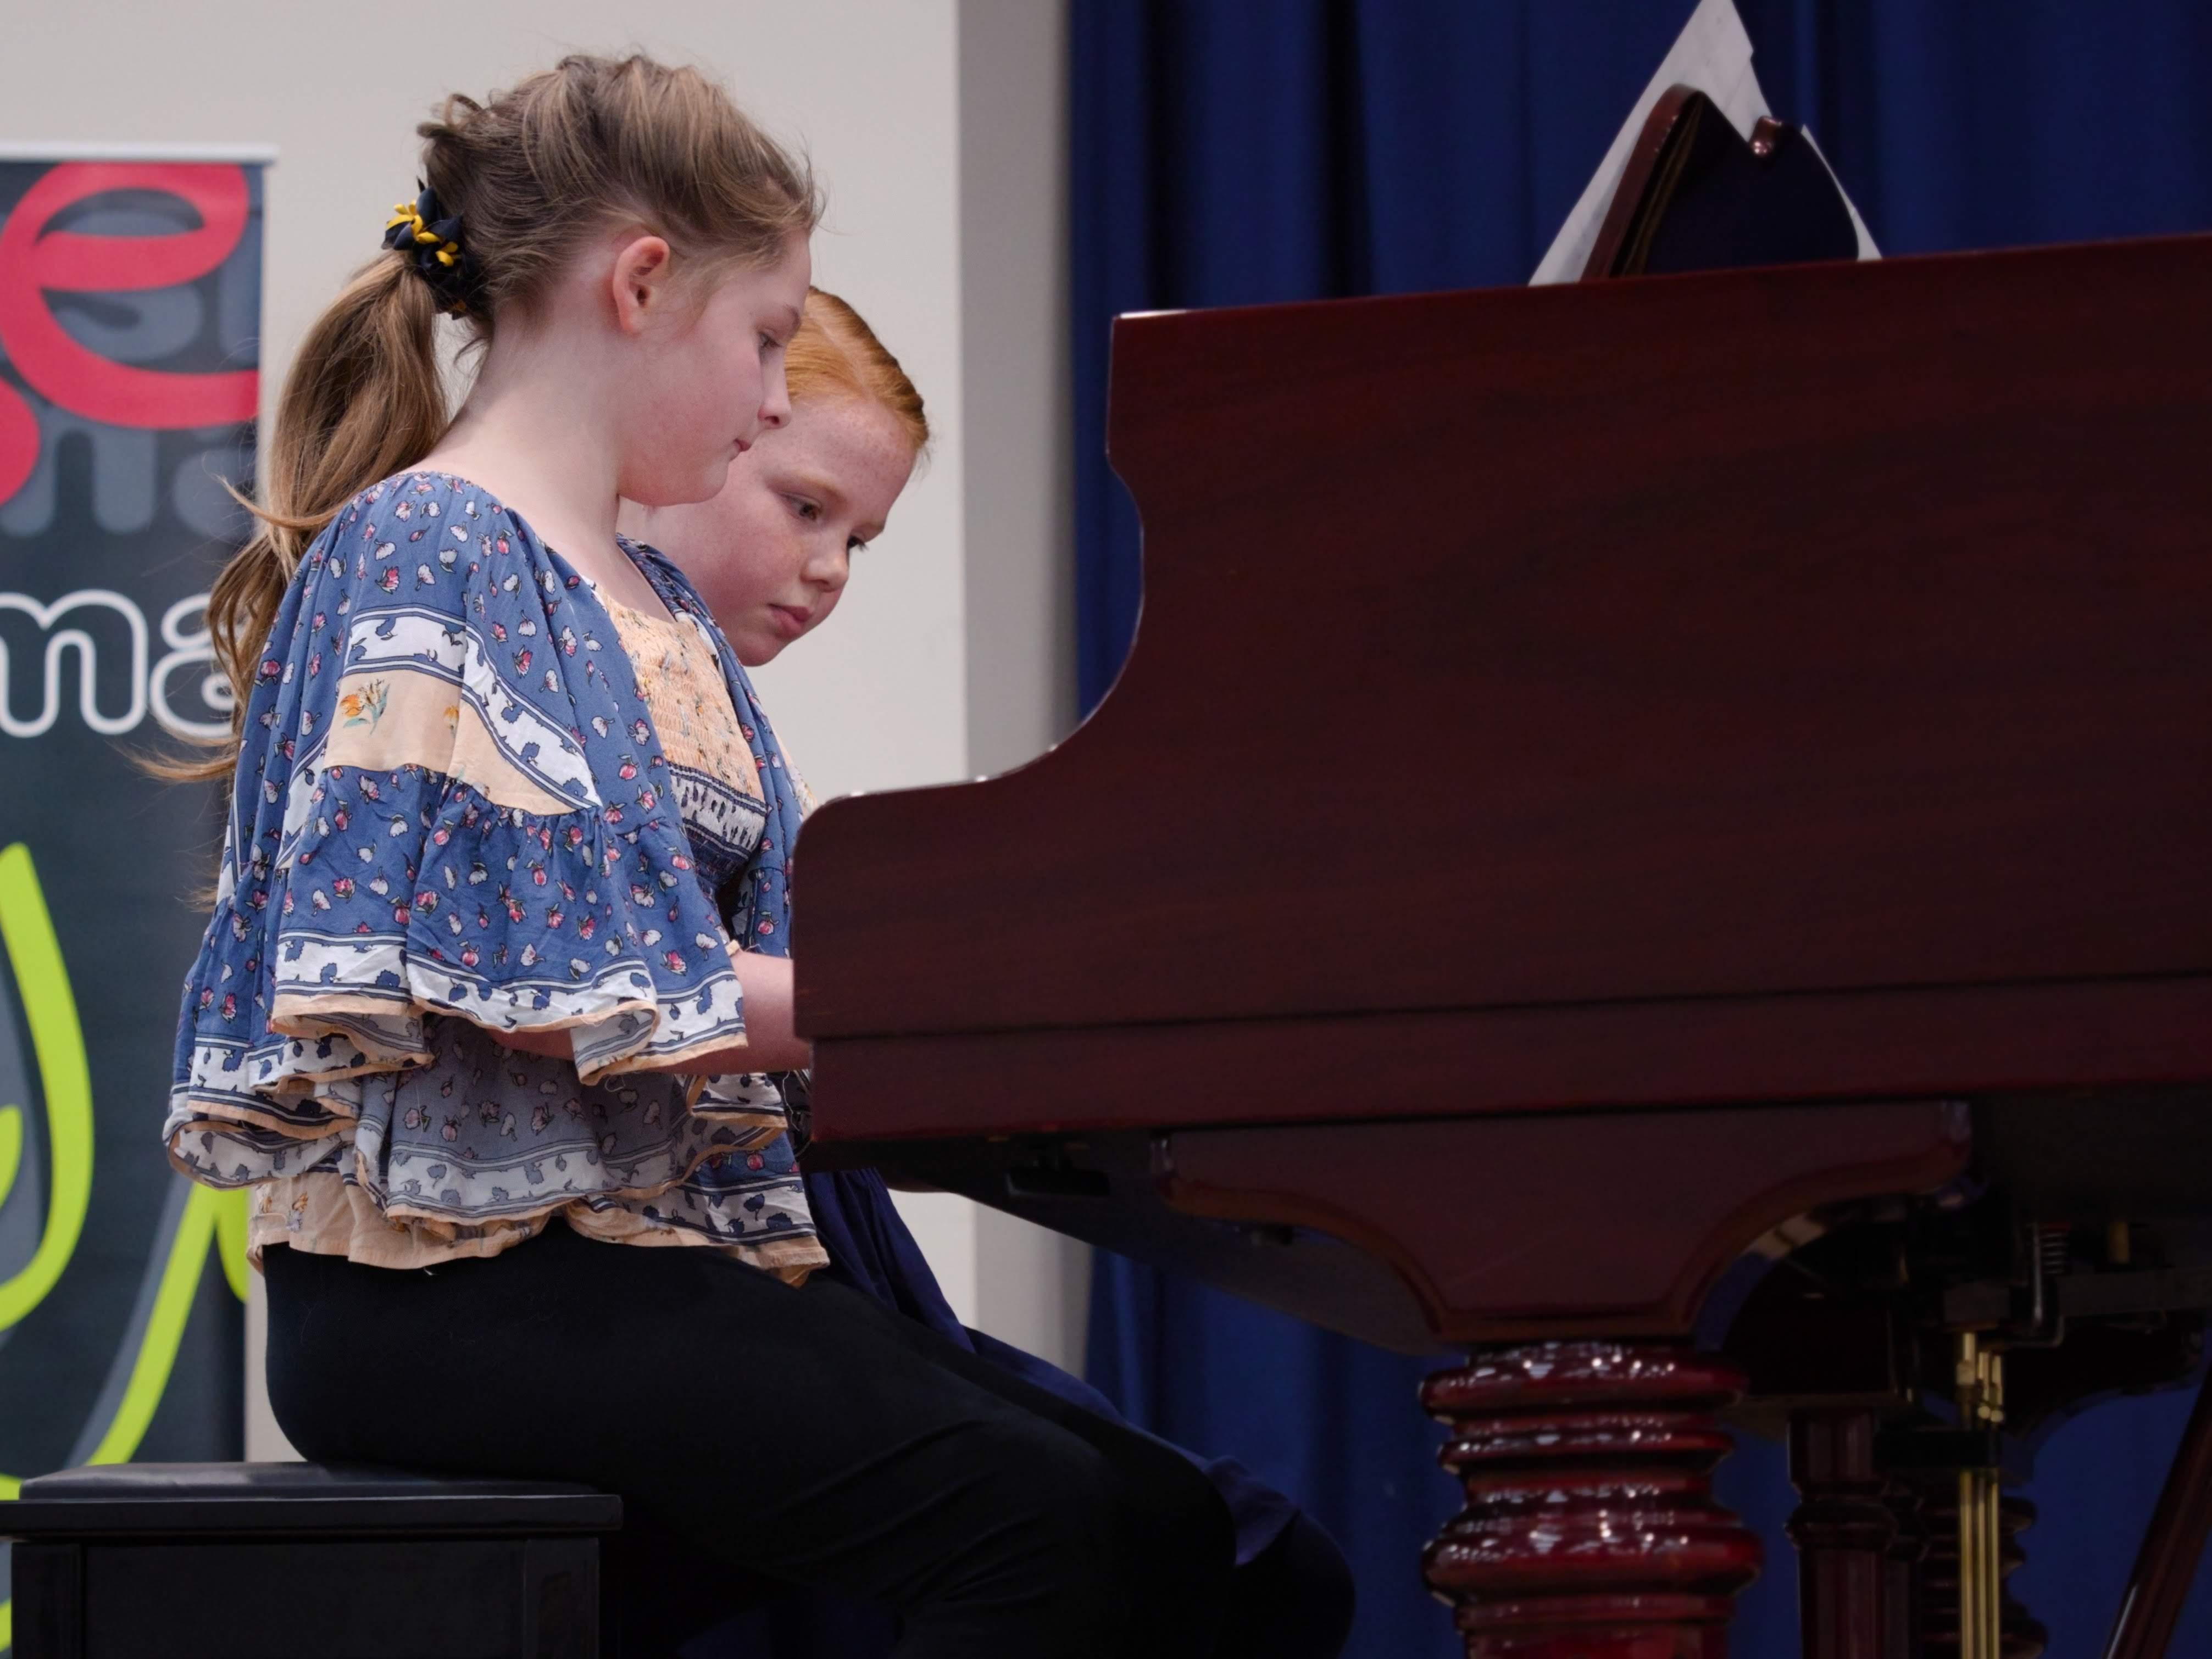 WGE Pianoforte Day 2 Evangeline Marquis & Gabrielle Hawkins Display their Skills on the Piano